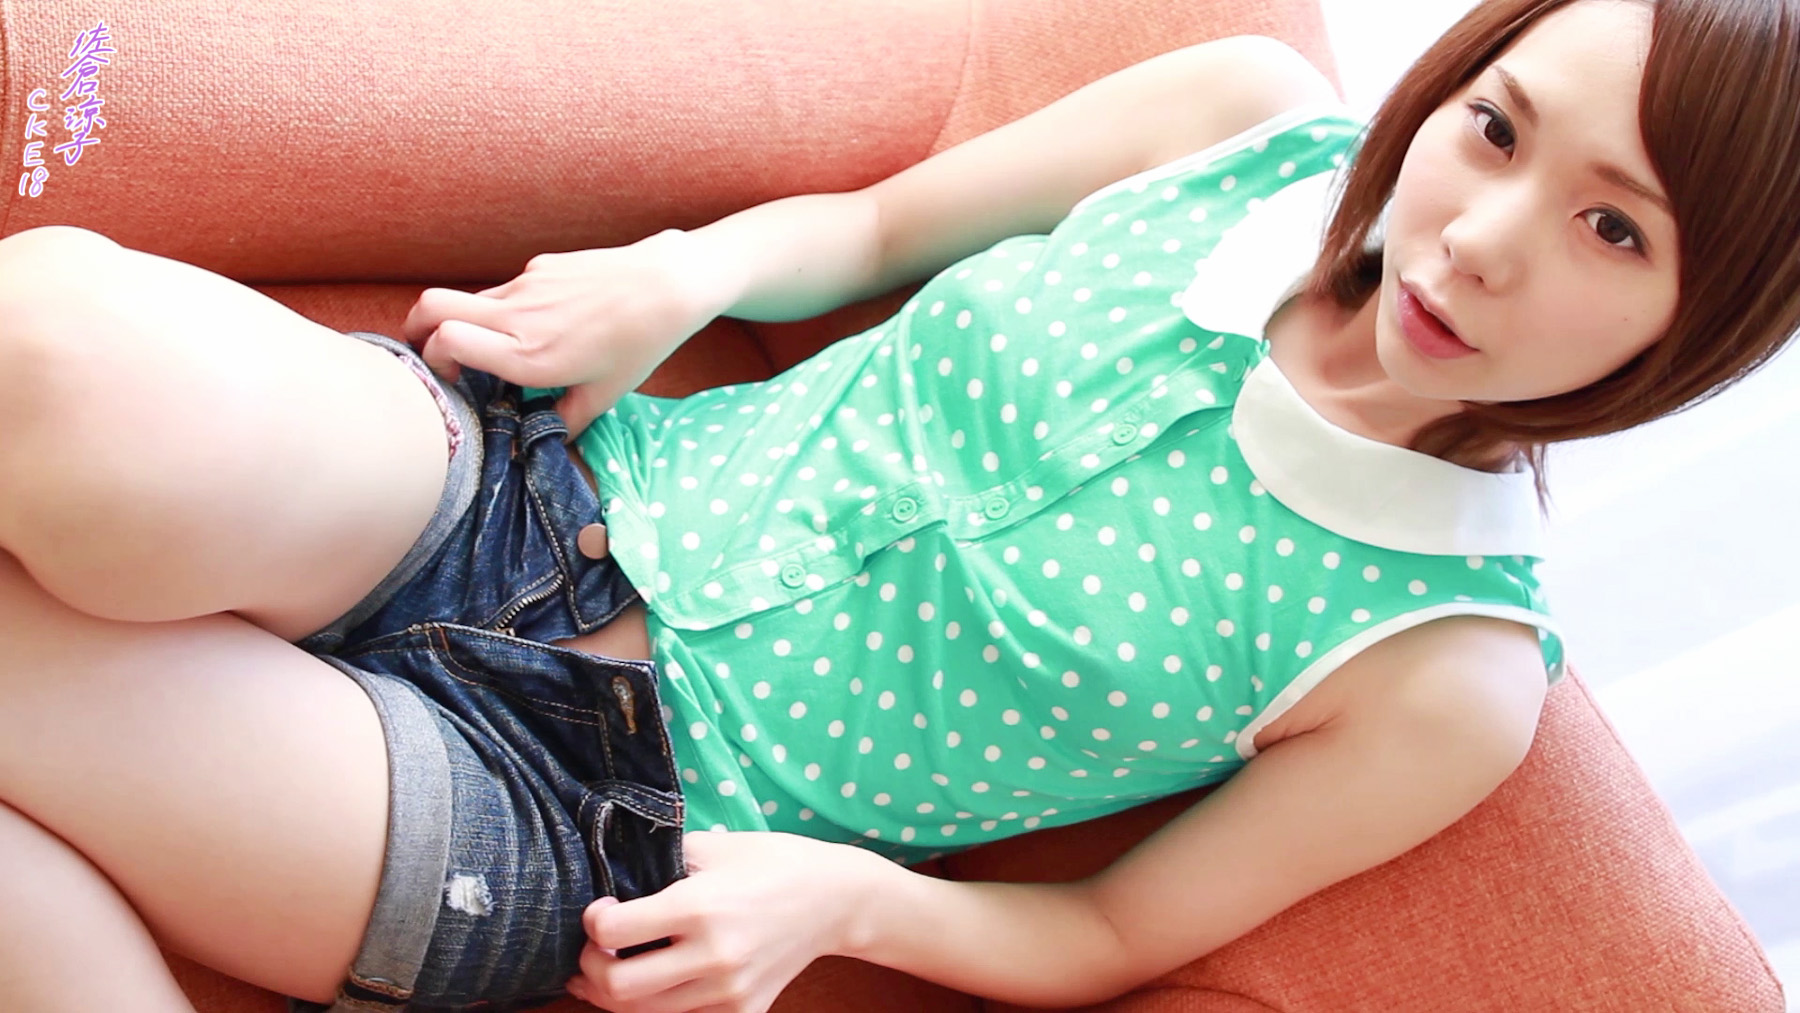 japanese-girl-fully-nude